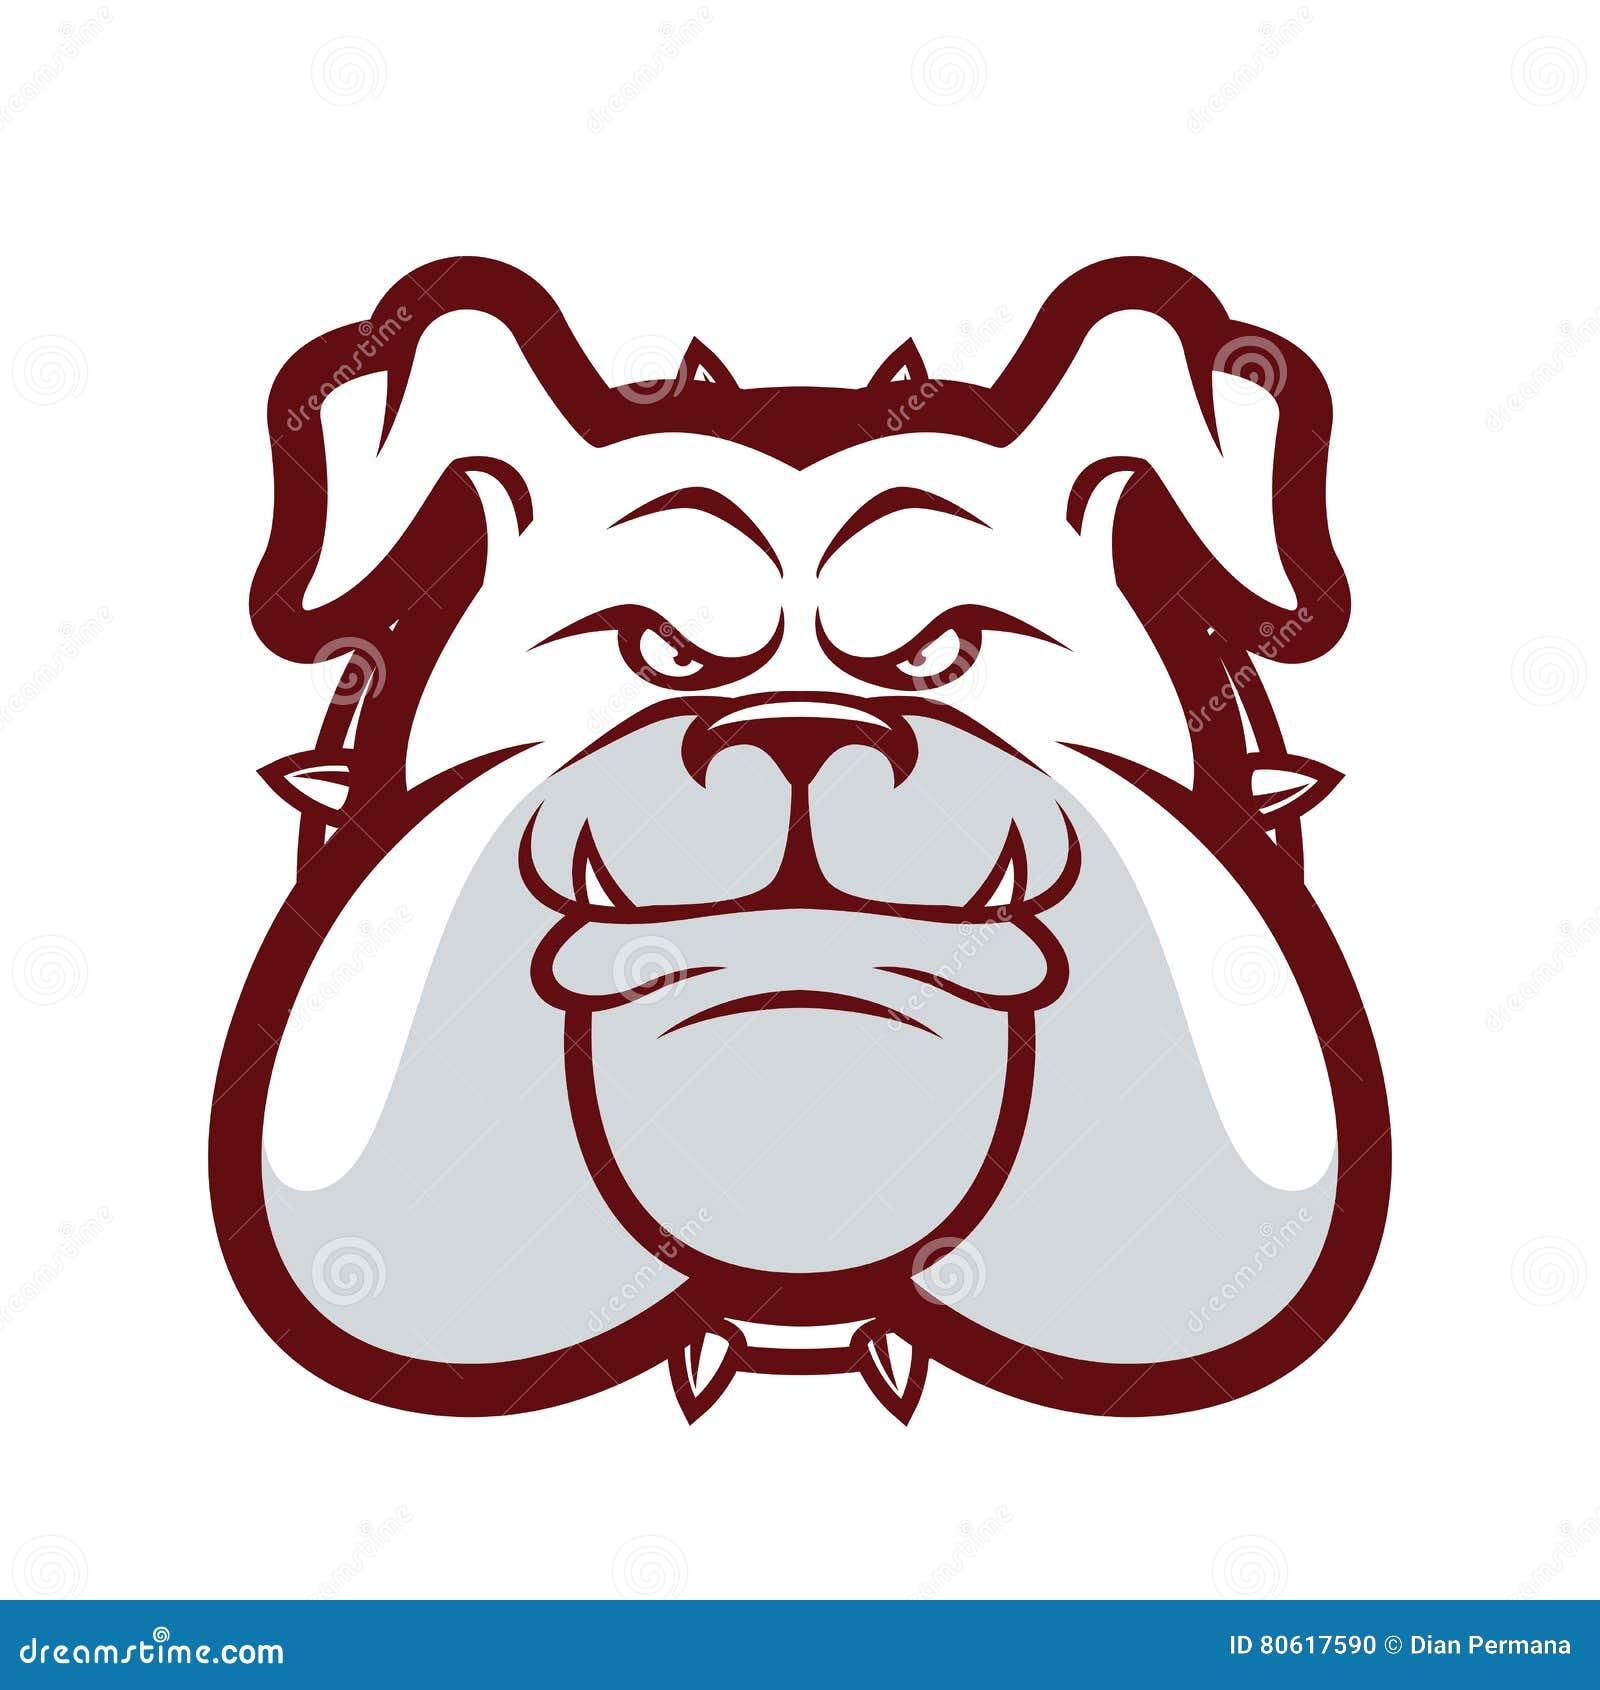 Bulldog Head Mascot Stock Vector Illustration Of Isolated 80617590